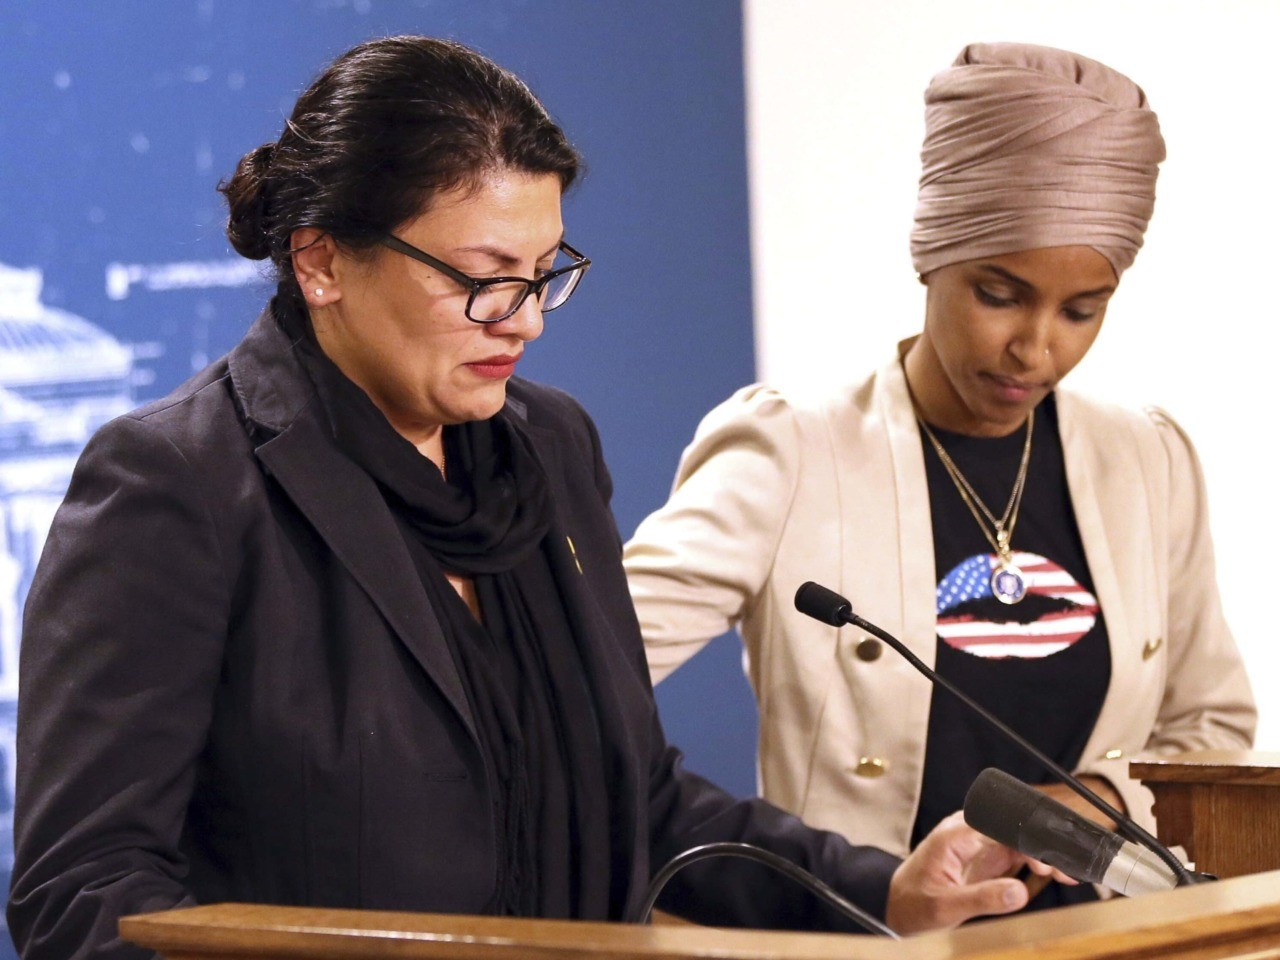 Ilhan Omar, Rashida Tlaib Fail to Criticize Palestinian Terrorism at Presser | Breitbart